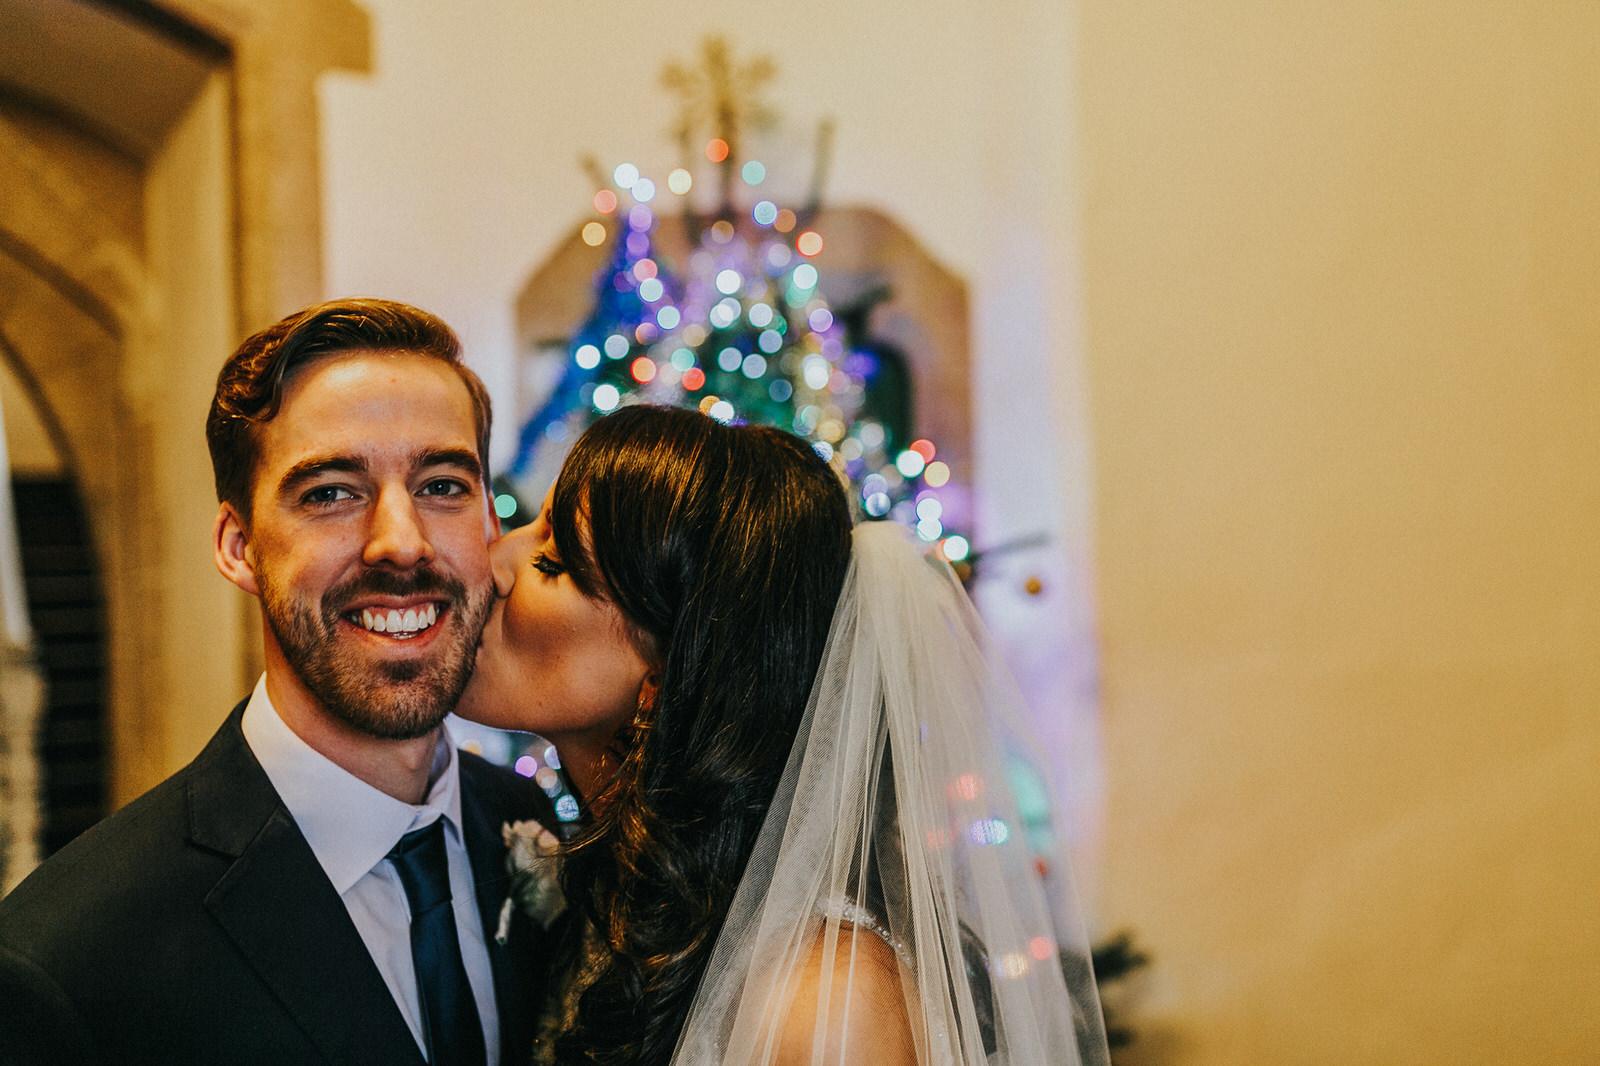 Roger_Kenny_wedding_photographer_448.jpg